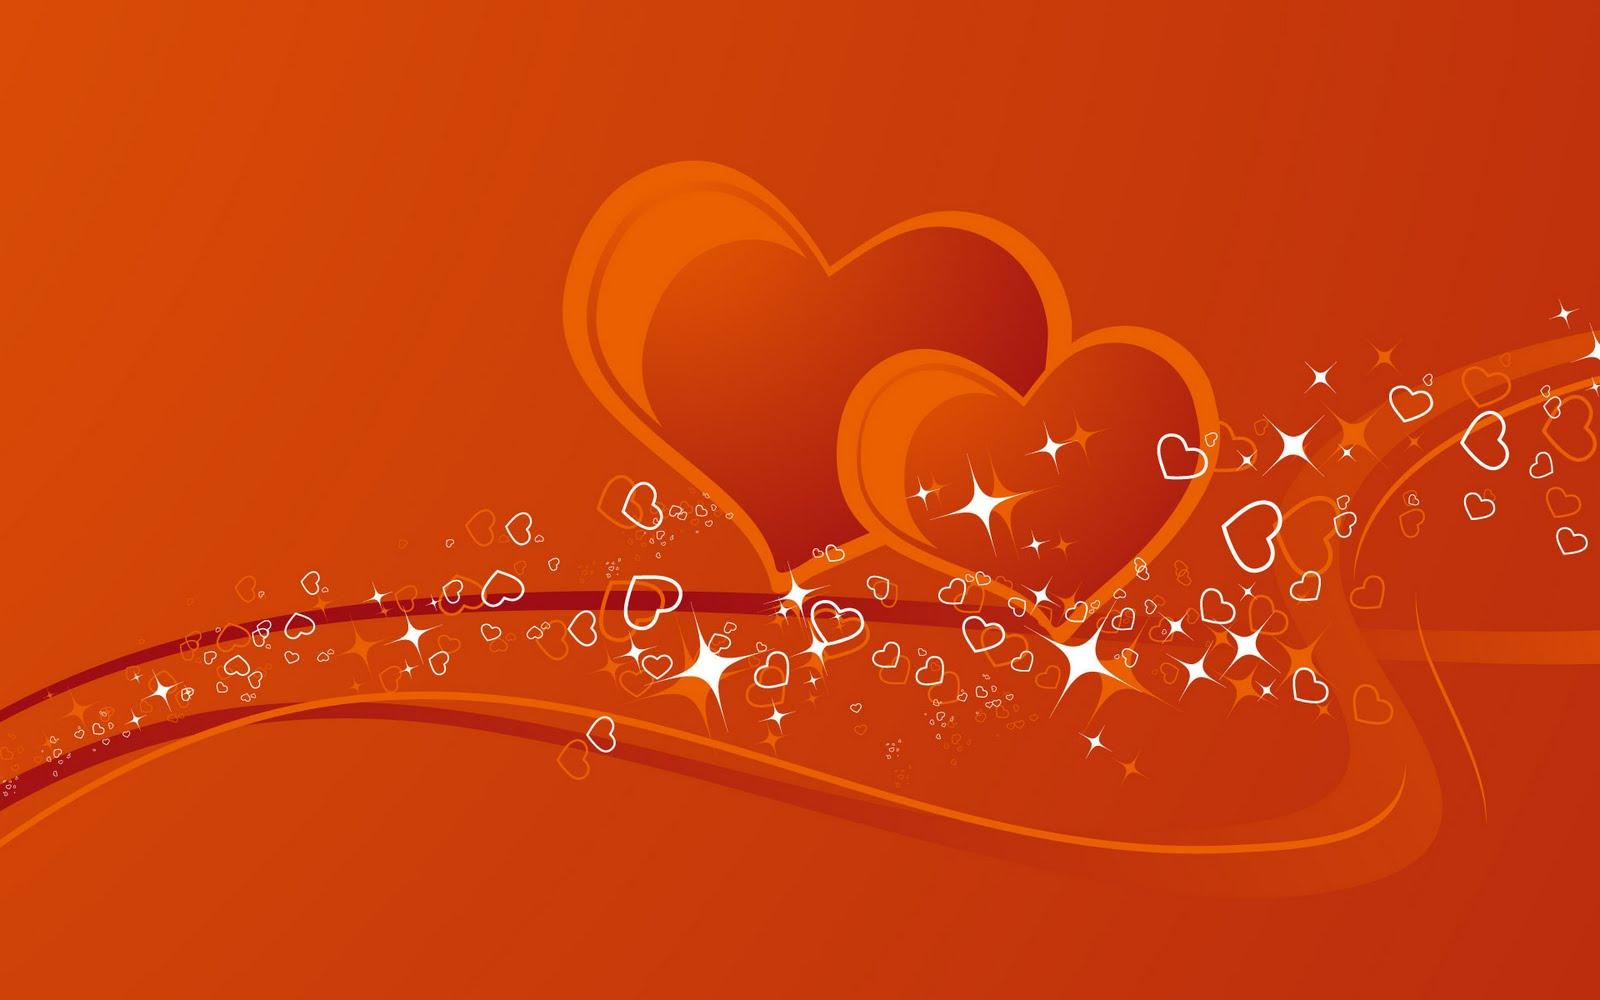 http://1.bp.blogspot.com/-cAqxvjOgvn8/TVaiKw9VaZI/AAAAAAAAFYQ/PCUmPGIeV5Q/s1600/valentines-day-wallpaper-5Final-Fantasy-HD-Wallpaper-1Salma_Hayek-sophie-choudhary-Alessandra-Ambrosio-Adriana%2BLim-emma-roberts-Love-wallpapers-romantic-hermione-granger-emma-watson4.jpg